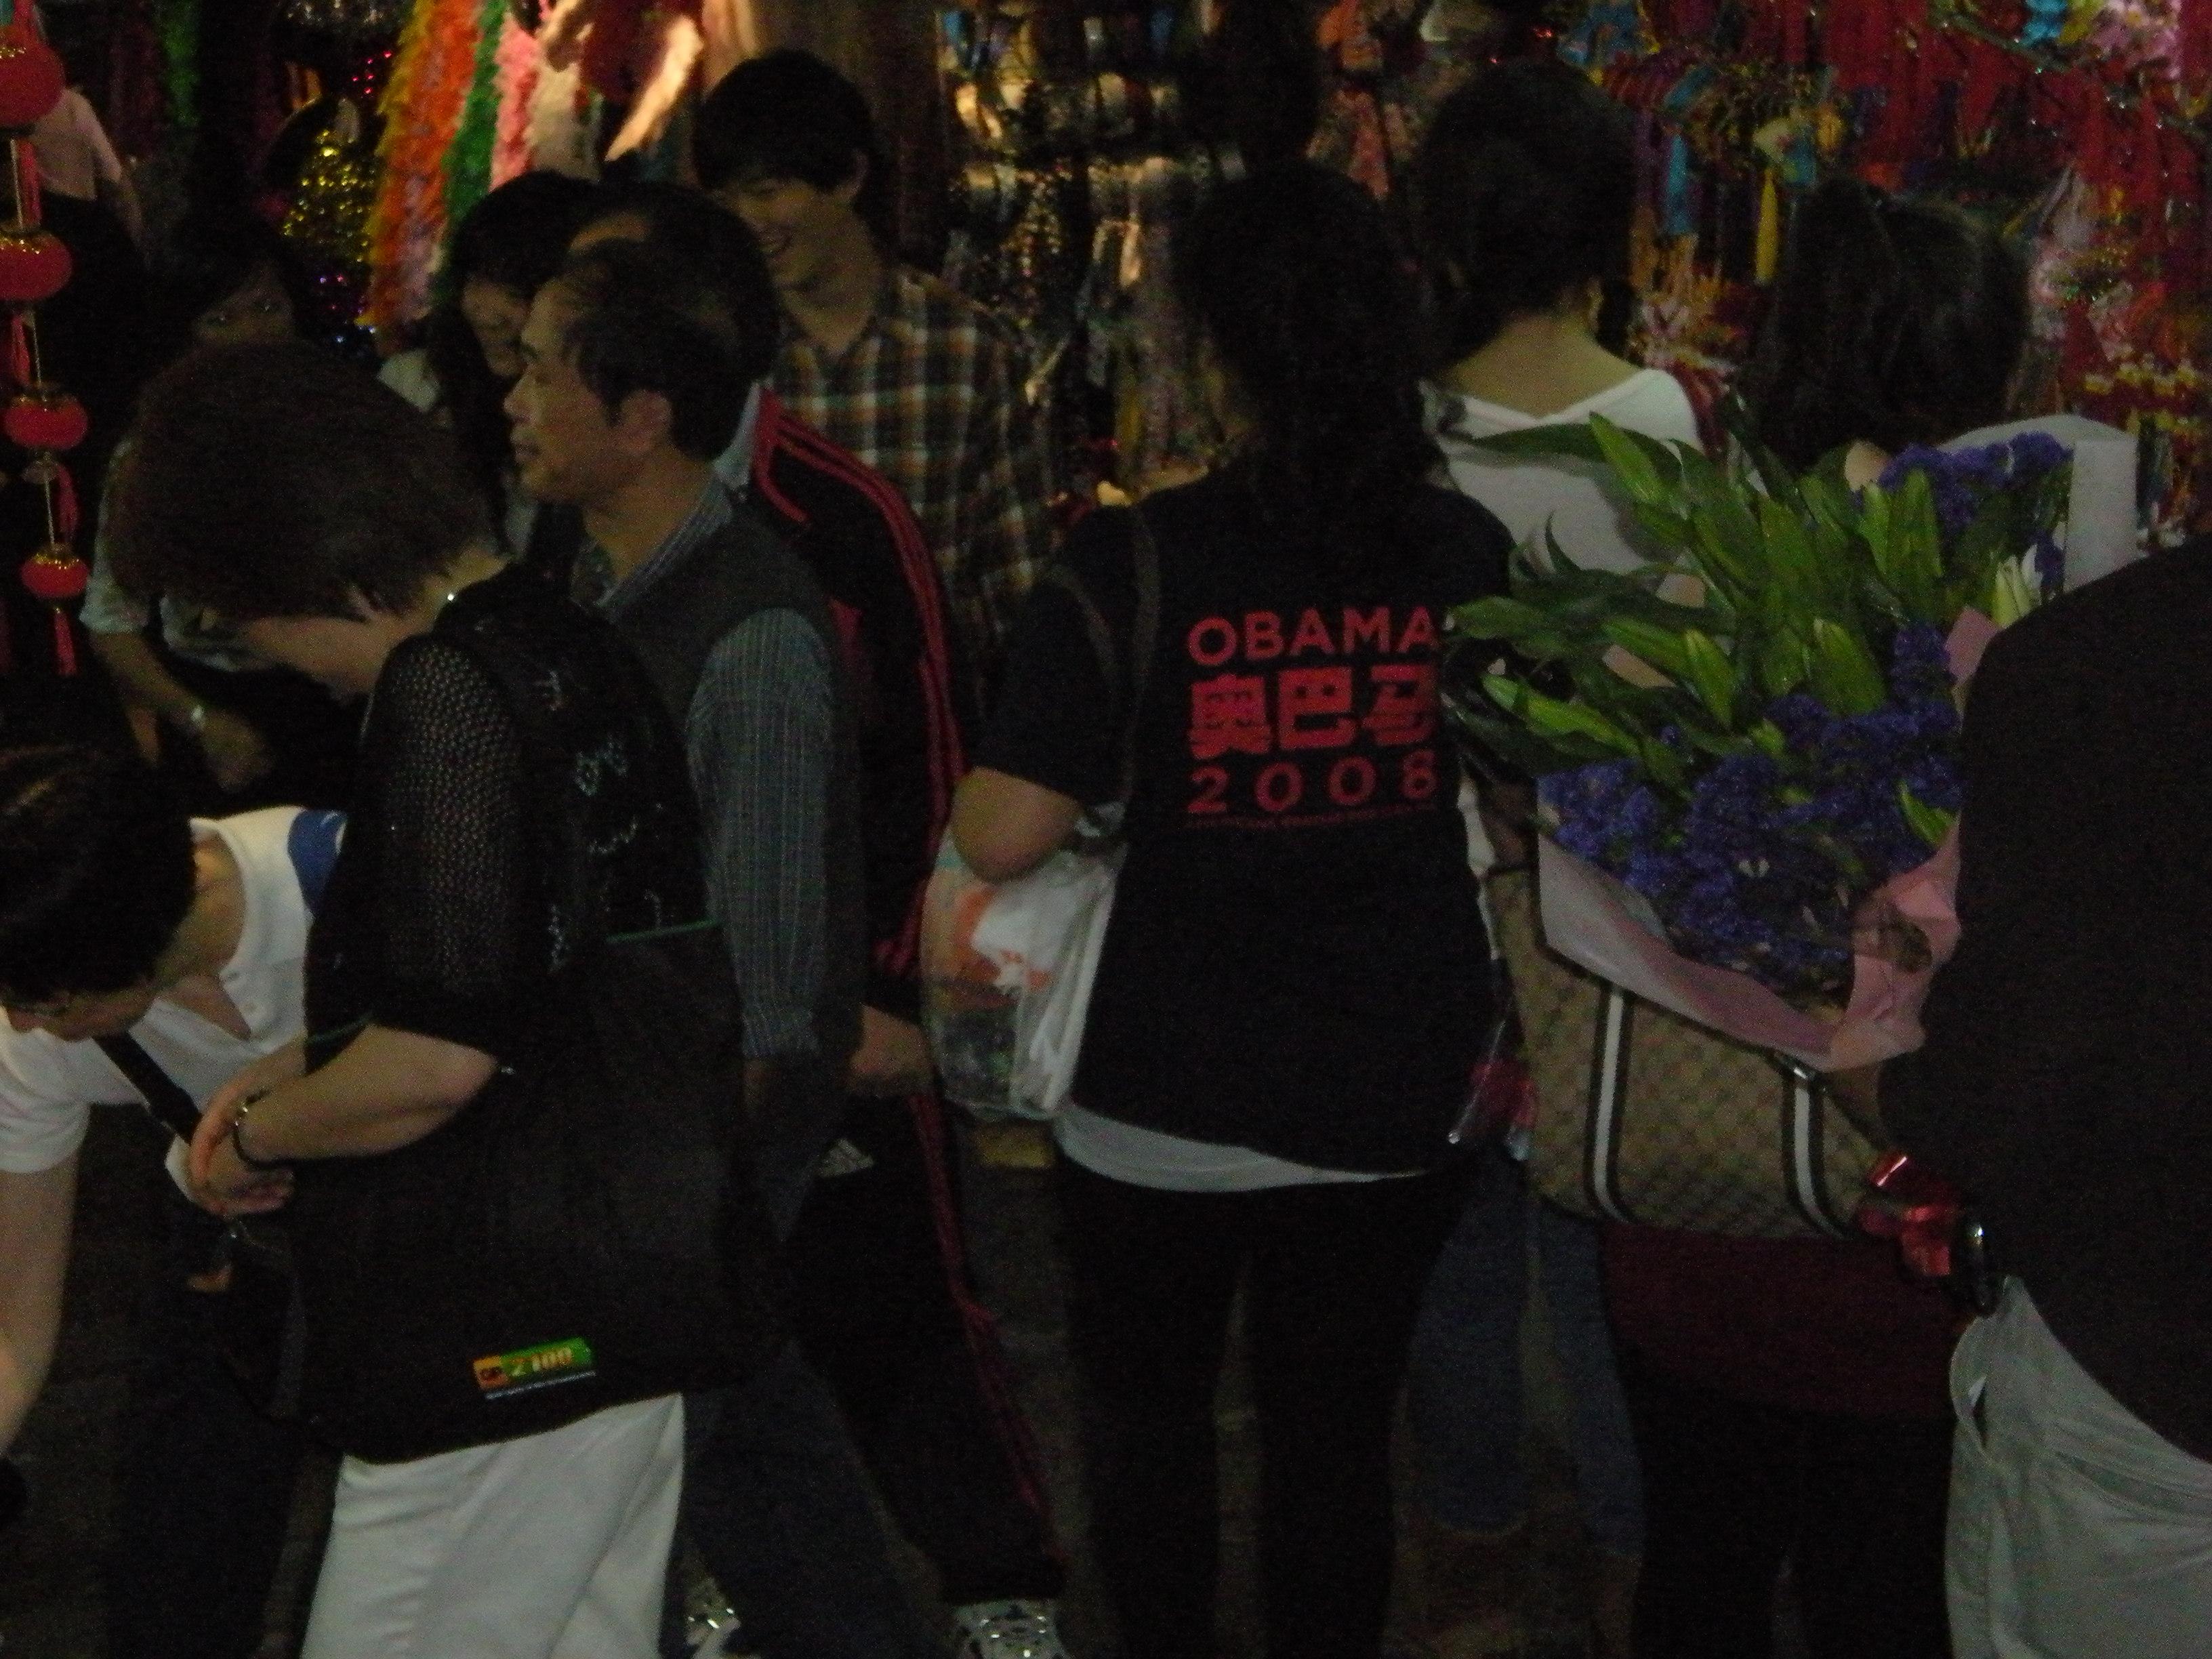 Obama shirt in Hong Kong